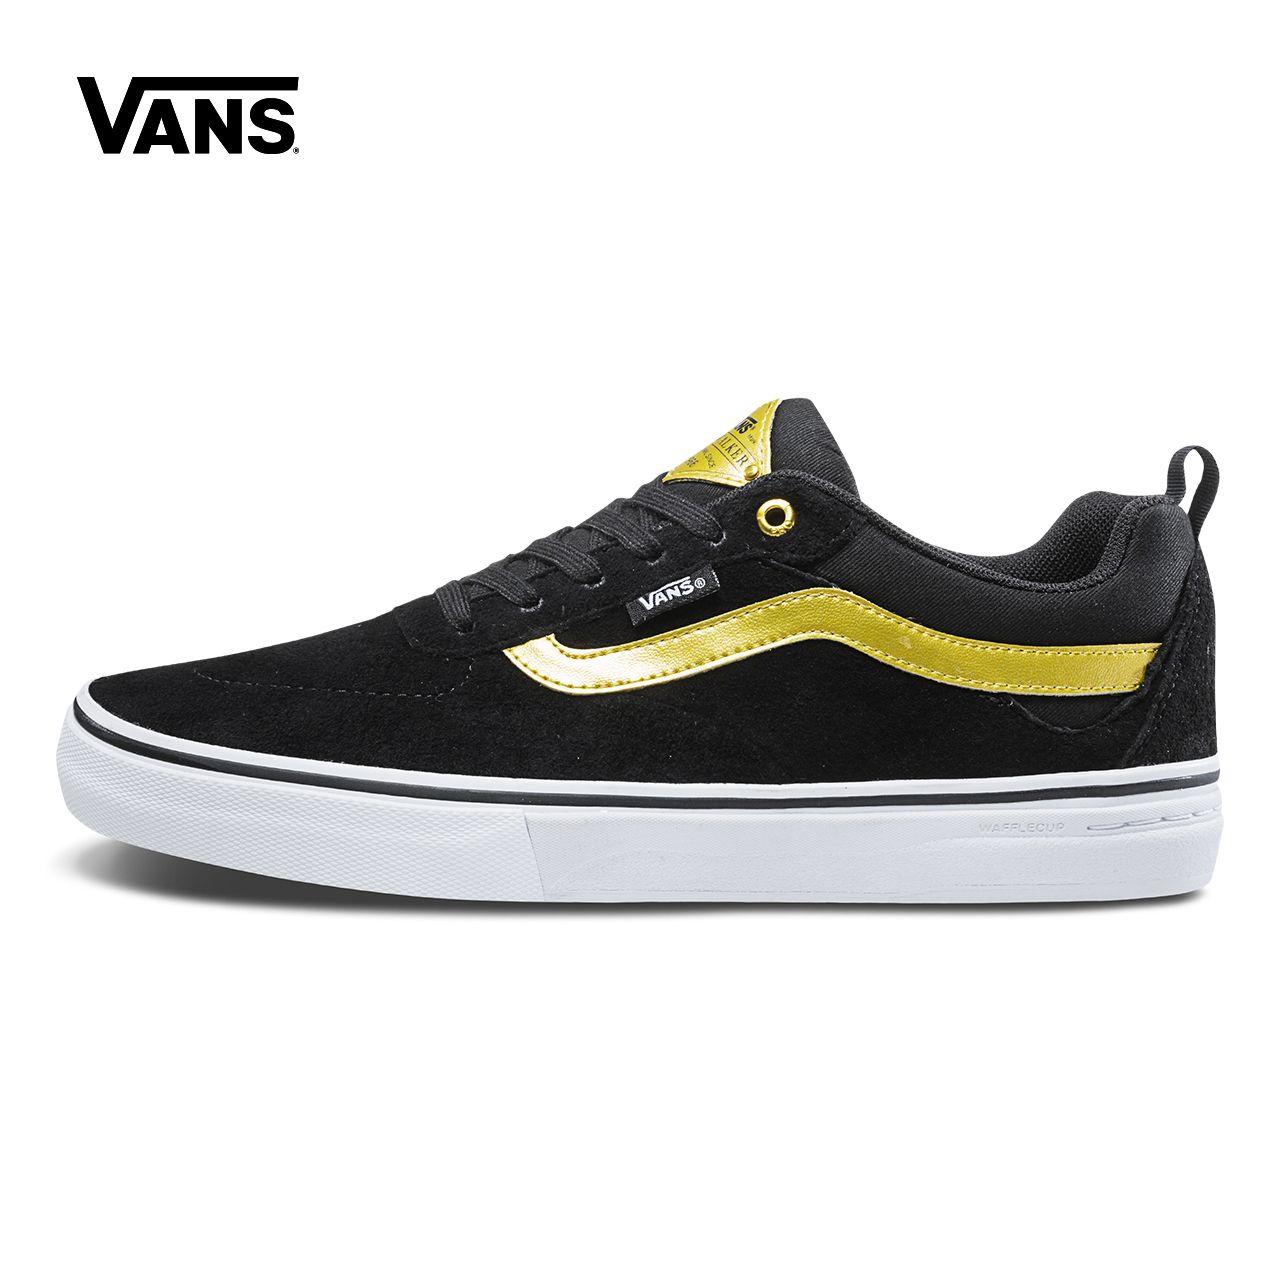 Original New Arrival Vans Mens Kyle Walker Pro Low-top Skateboarding Shoes Pro Skate Sneakers Canvas Sport Outdoor VN0A2XSGB2G